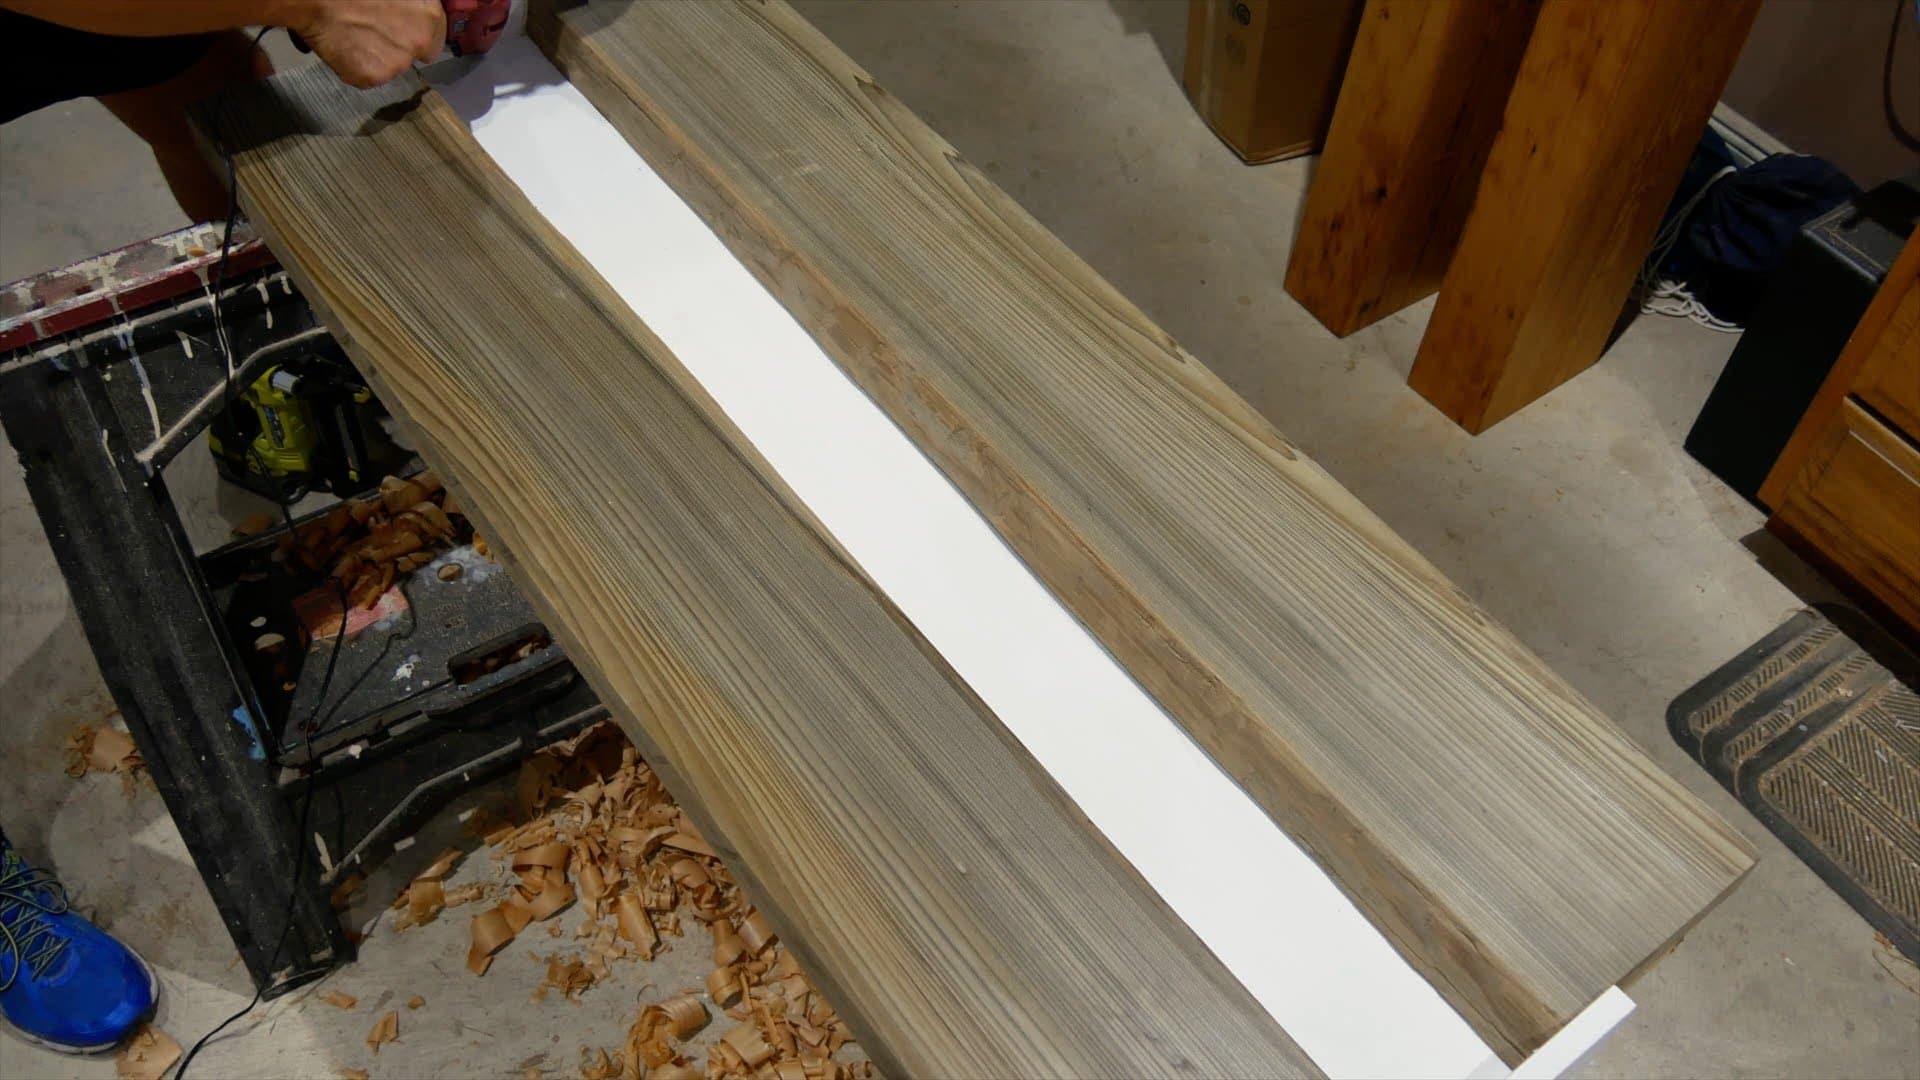 epoxy-resin-river-table-glowpowder_20171016_13